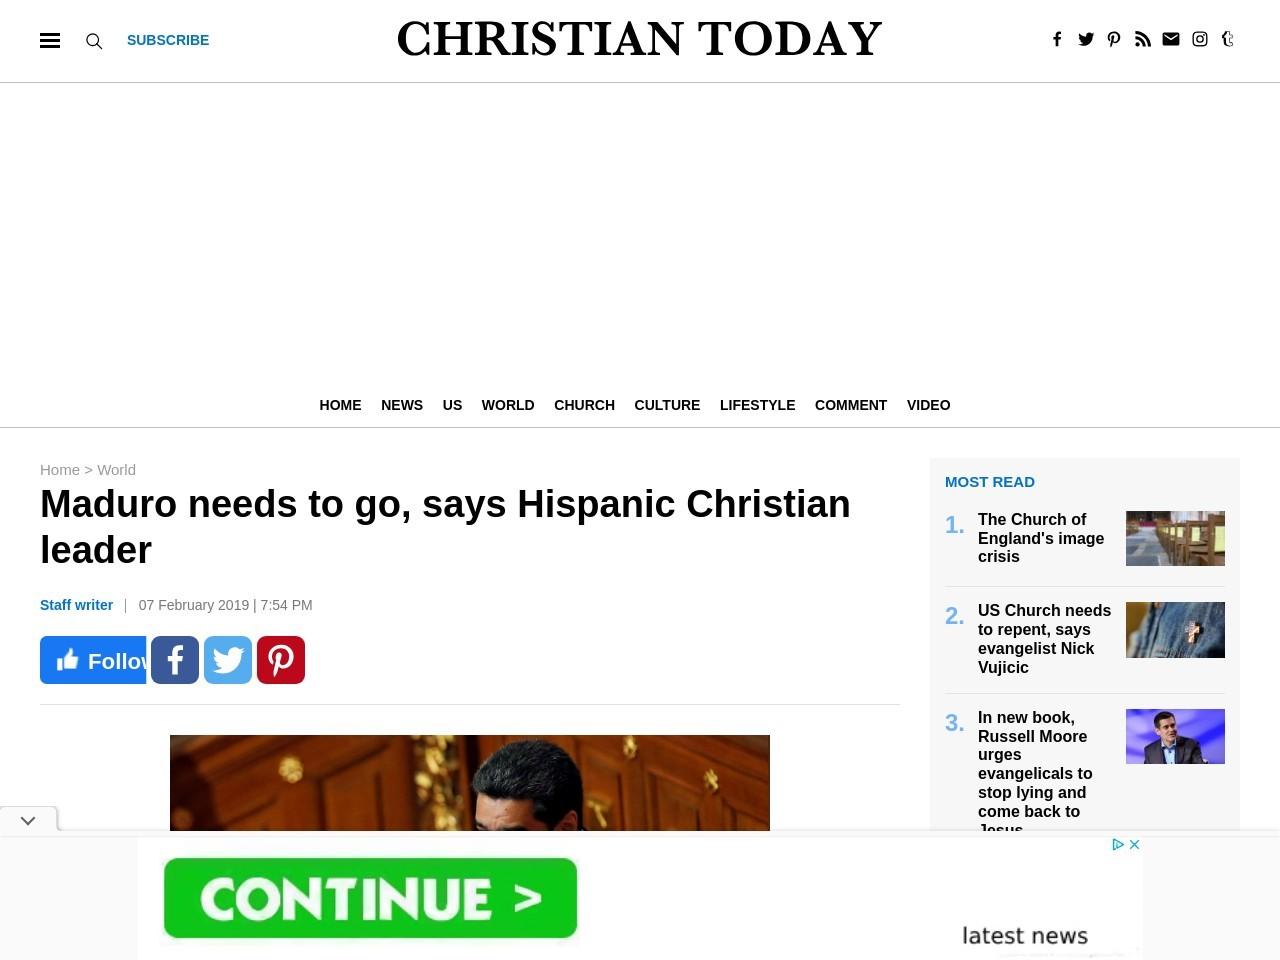 Maduro needs to go, says Hispanic Christian leader